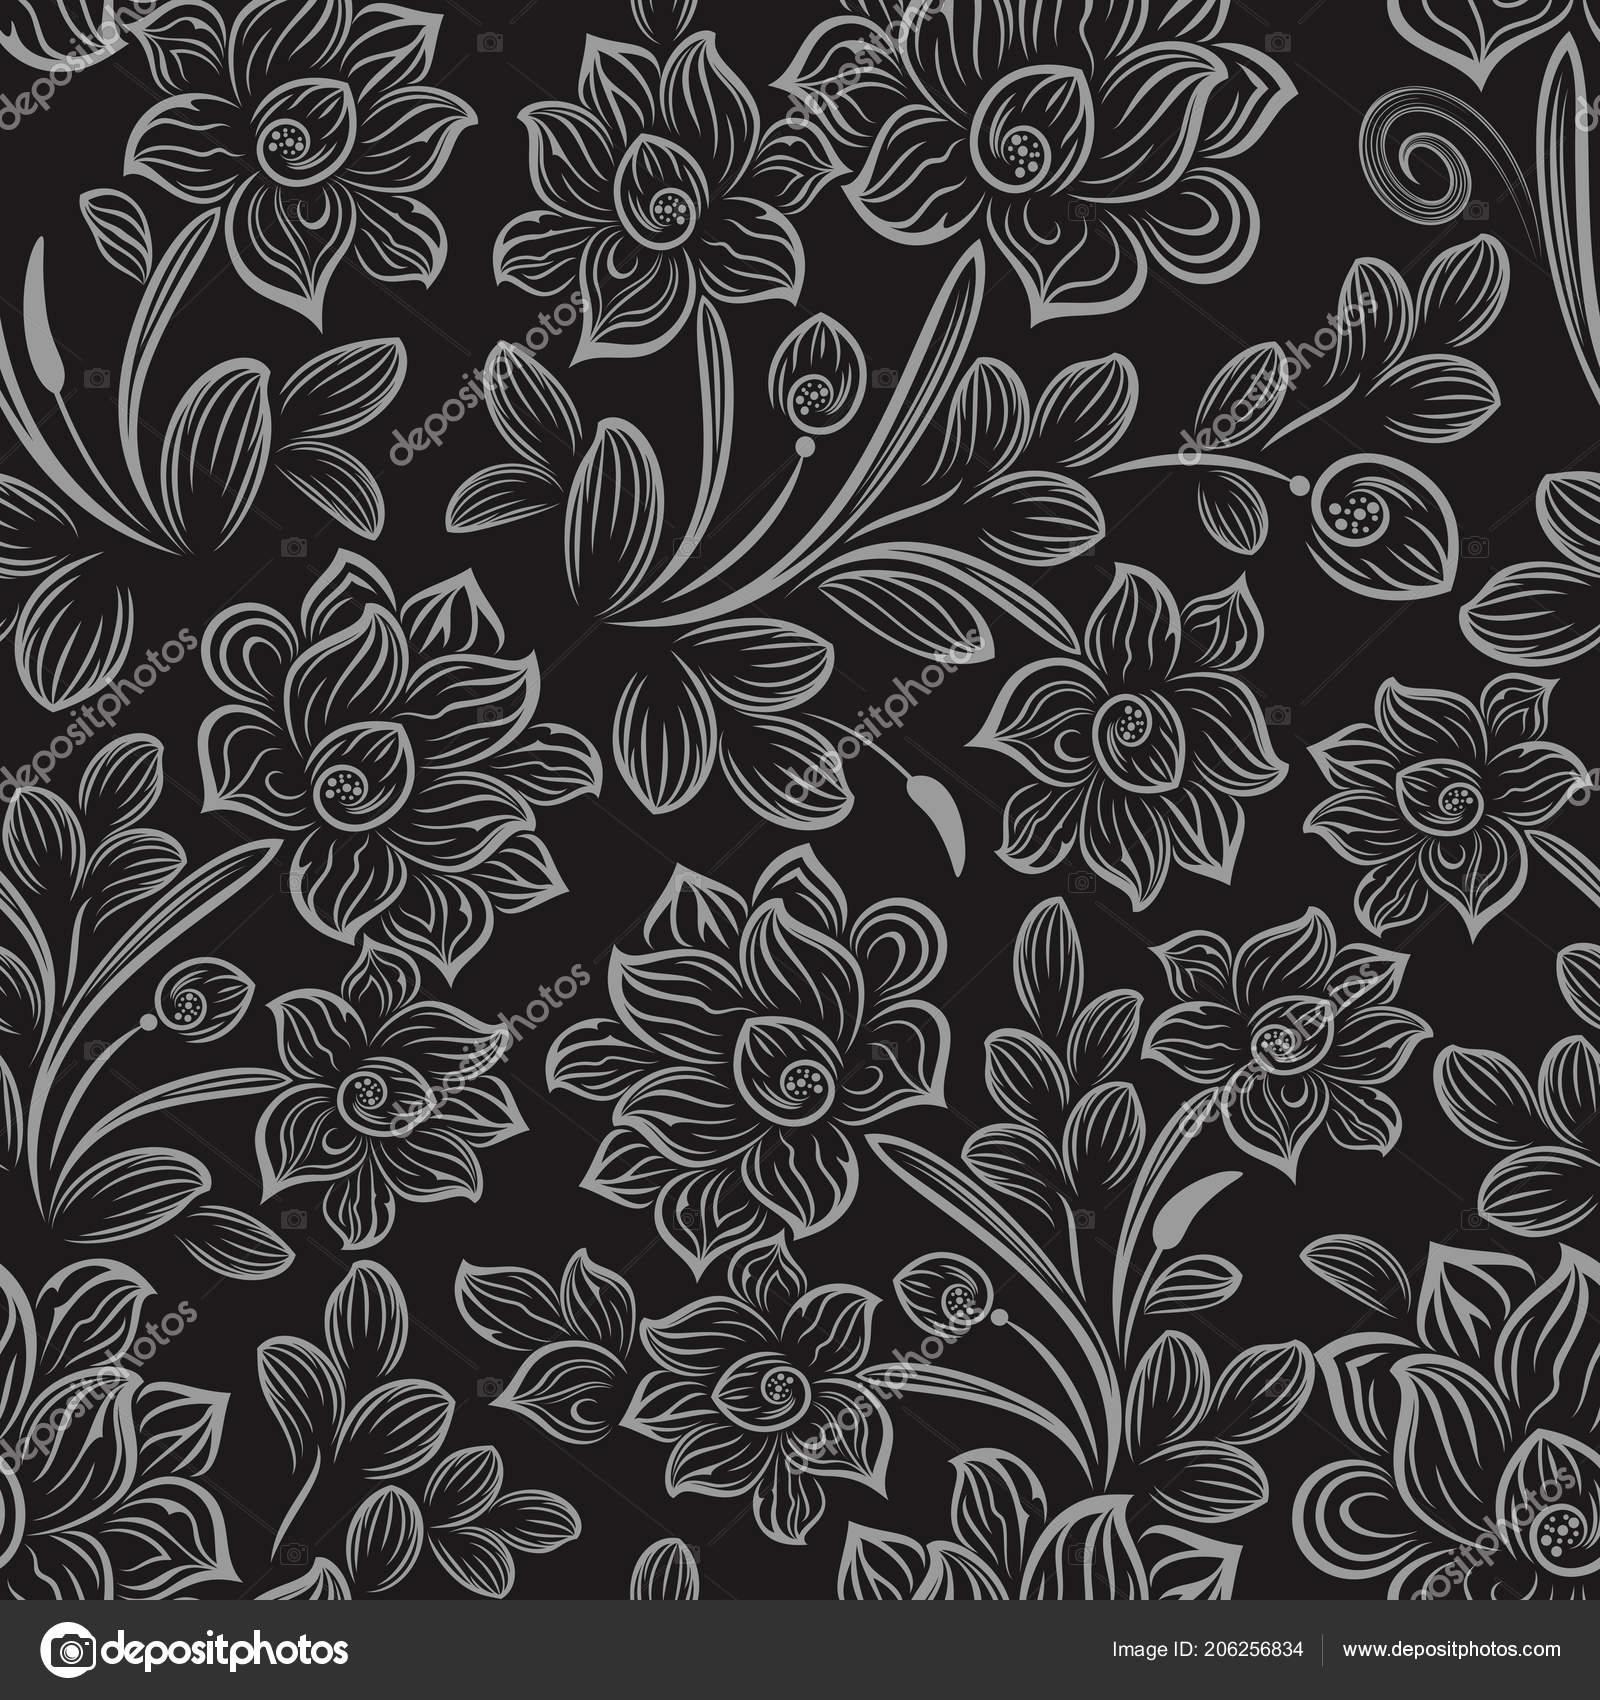 depositphotos 206256834 stock illustration black white seamless floral wallpaper